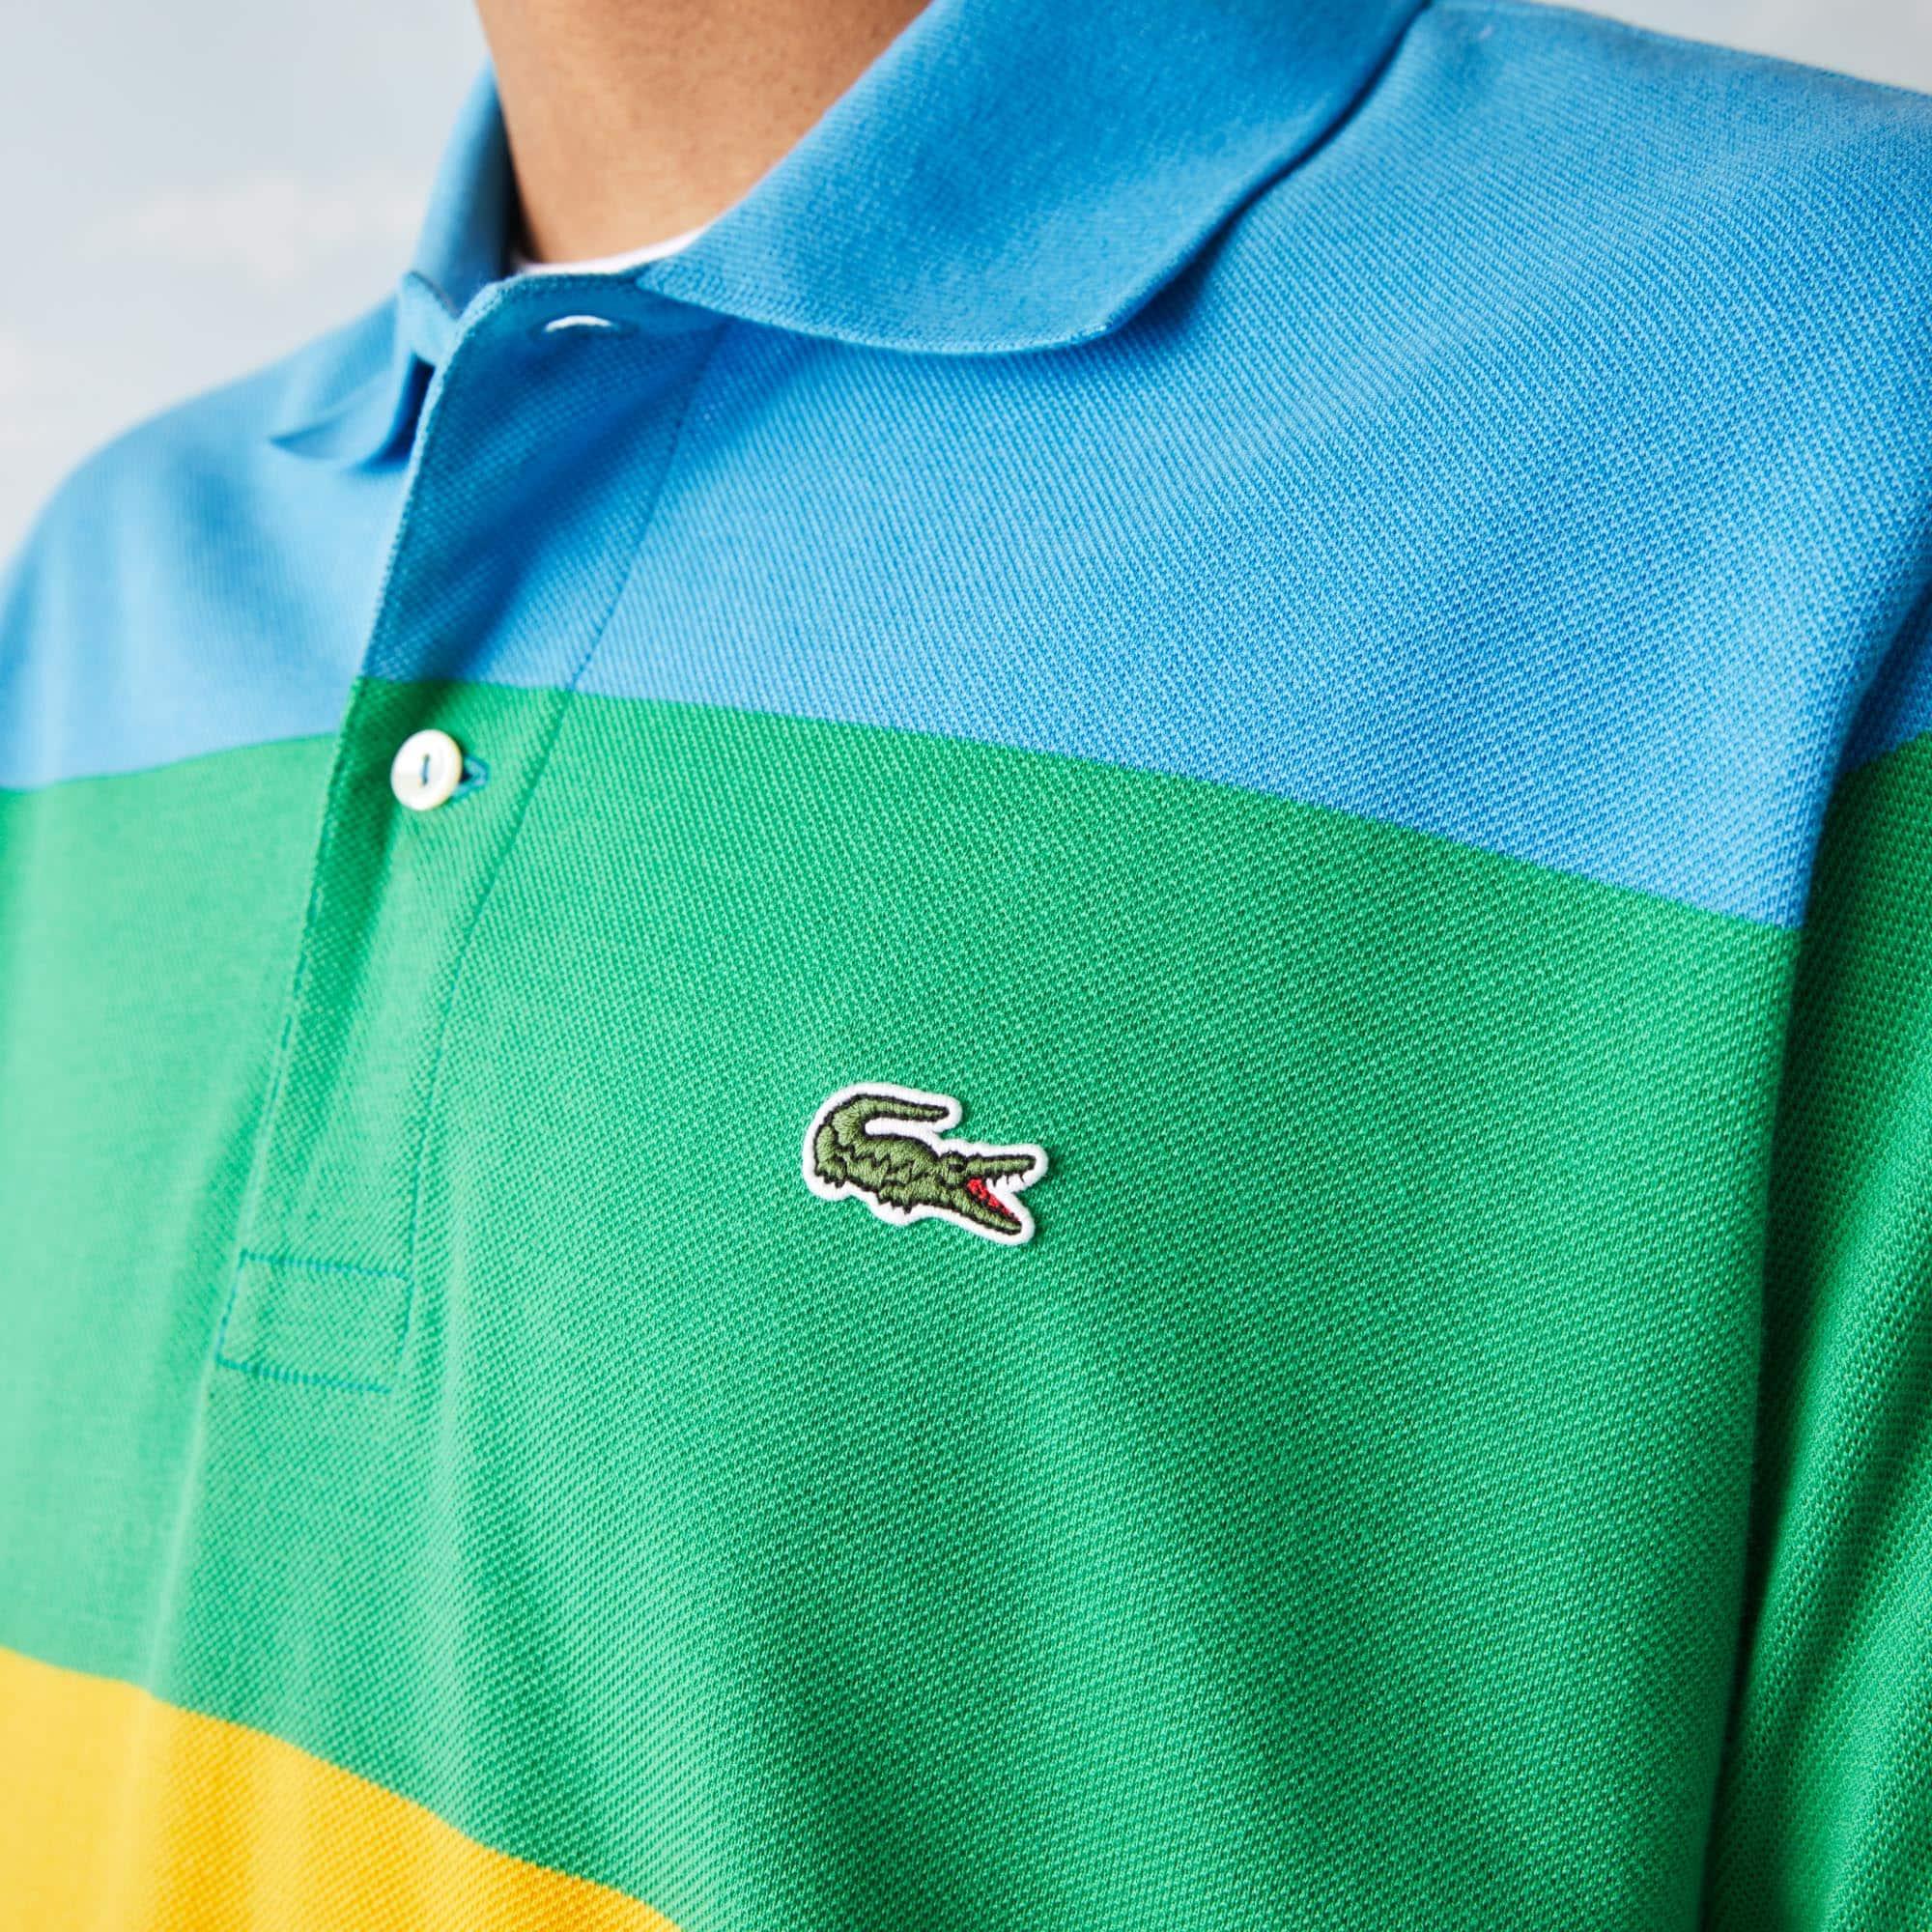 Men's Lacoste x Polaroid Colour Striped Classic Fit Polo Shirt